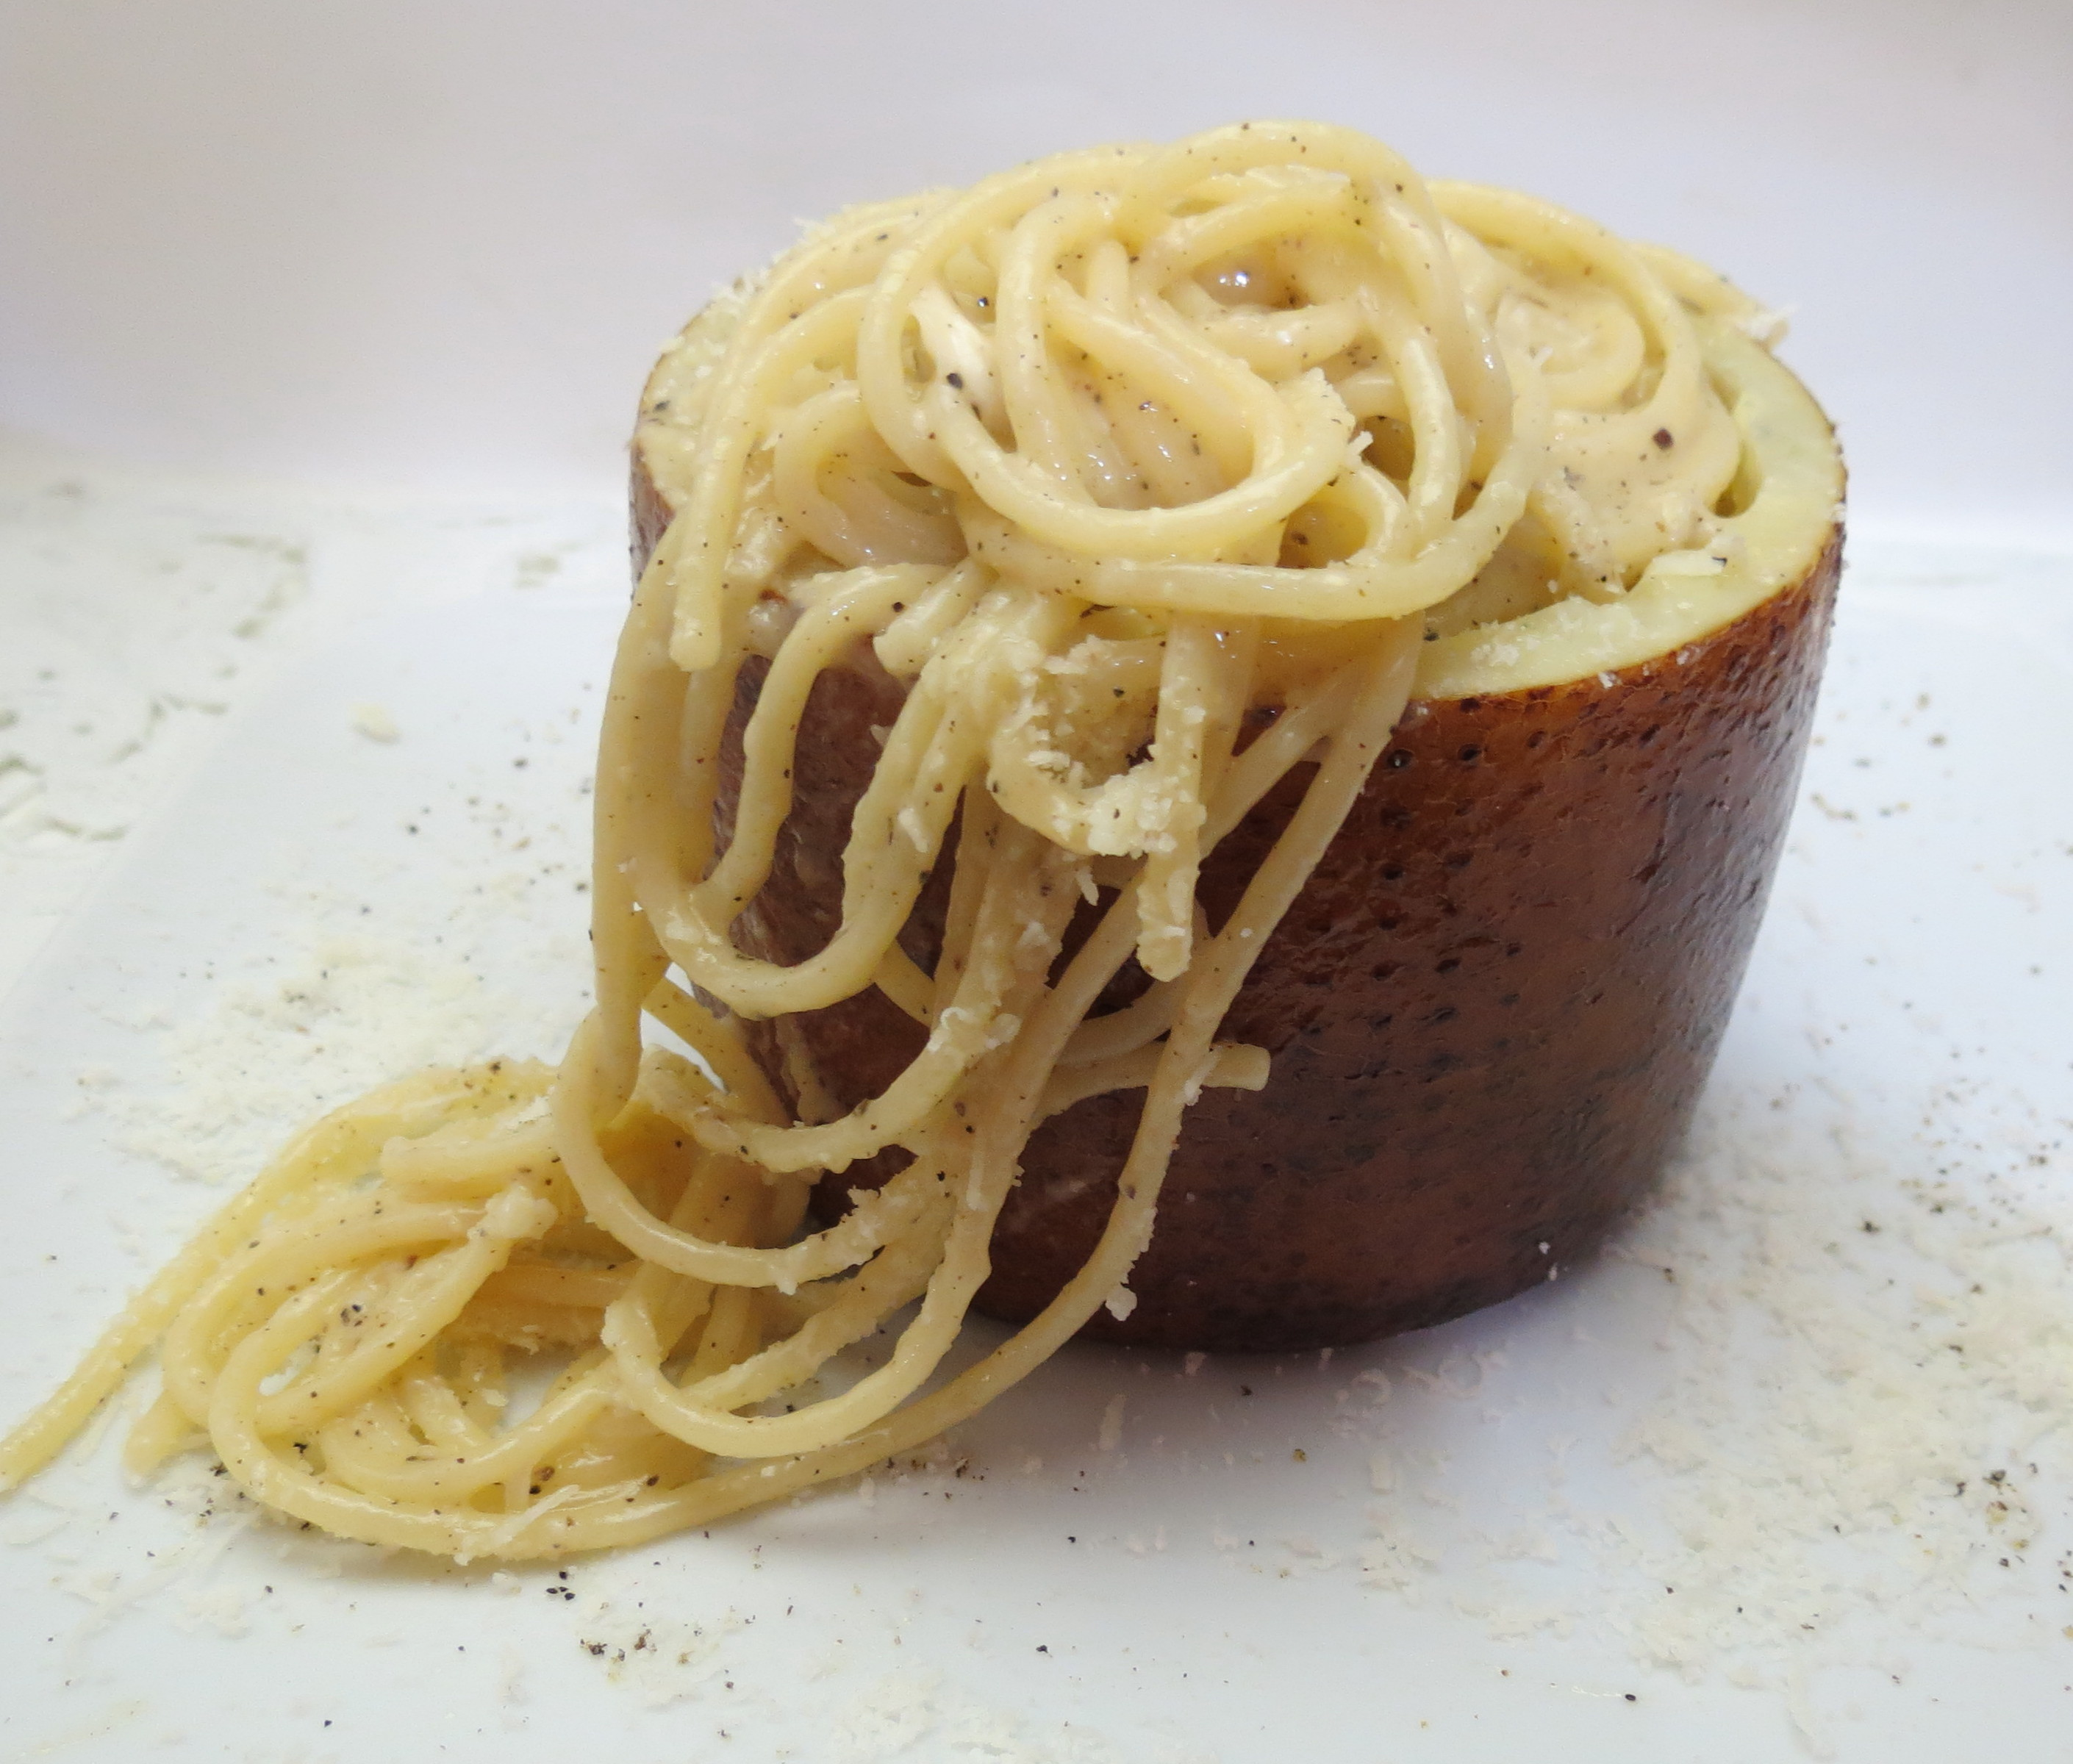 ... cacio home page tonnarelli cacio e pepe spaghetti cacio e pepe